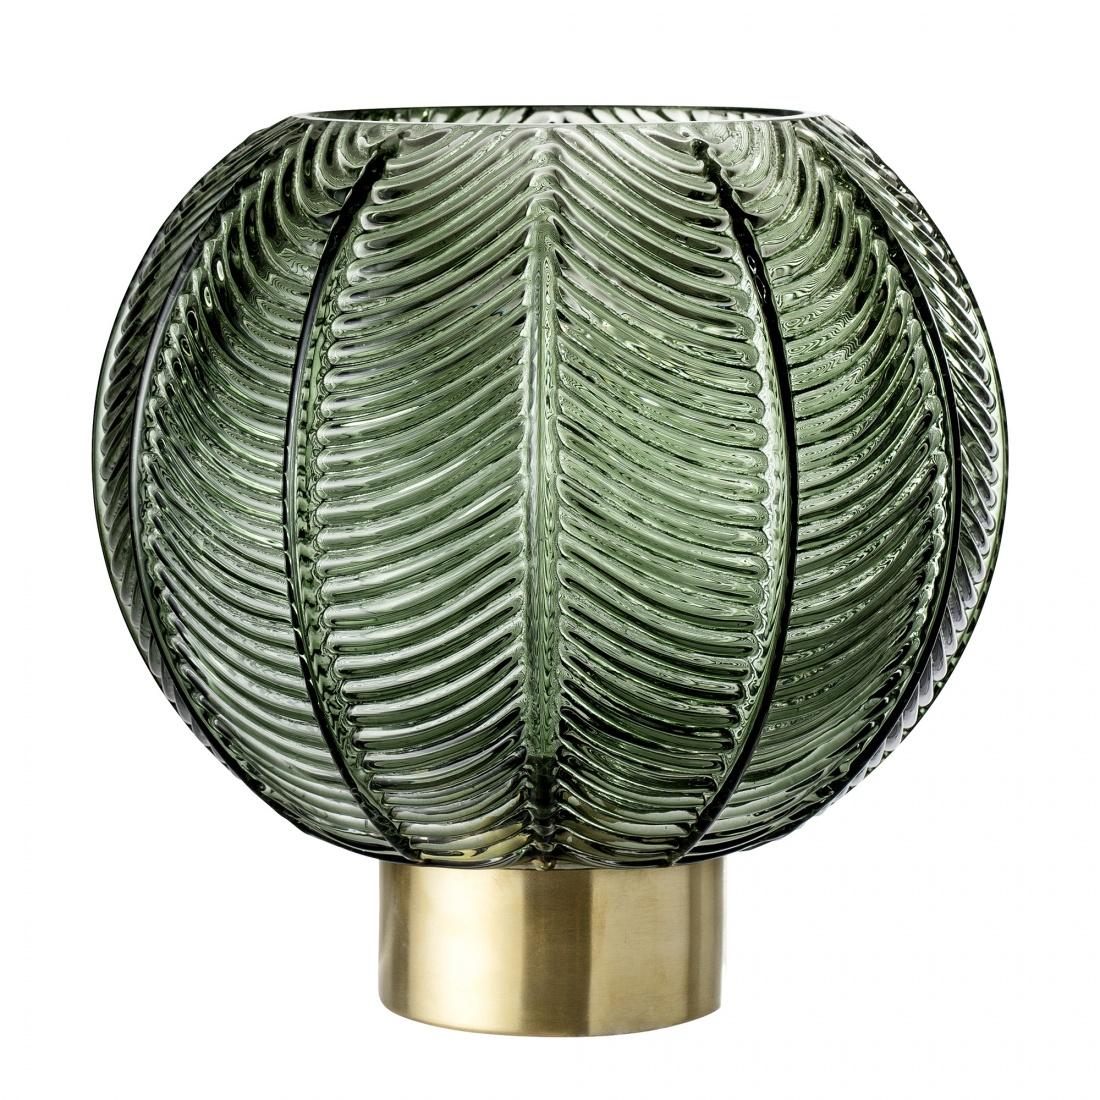 vase-fern-vert-bloomingville_1-z